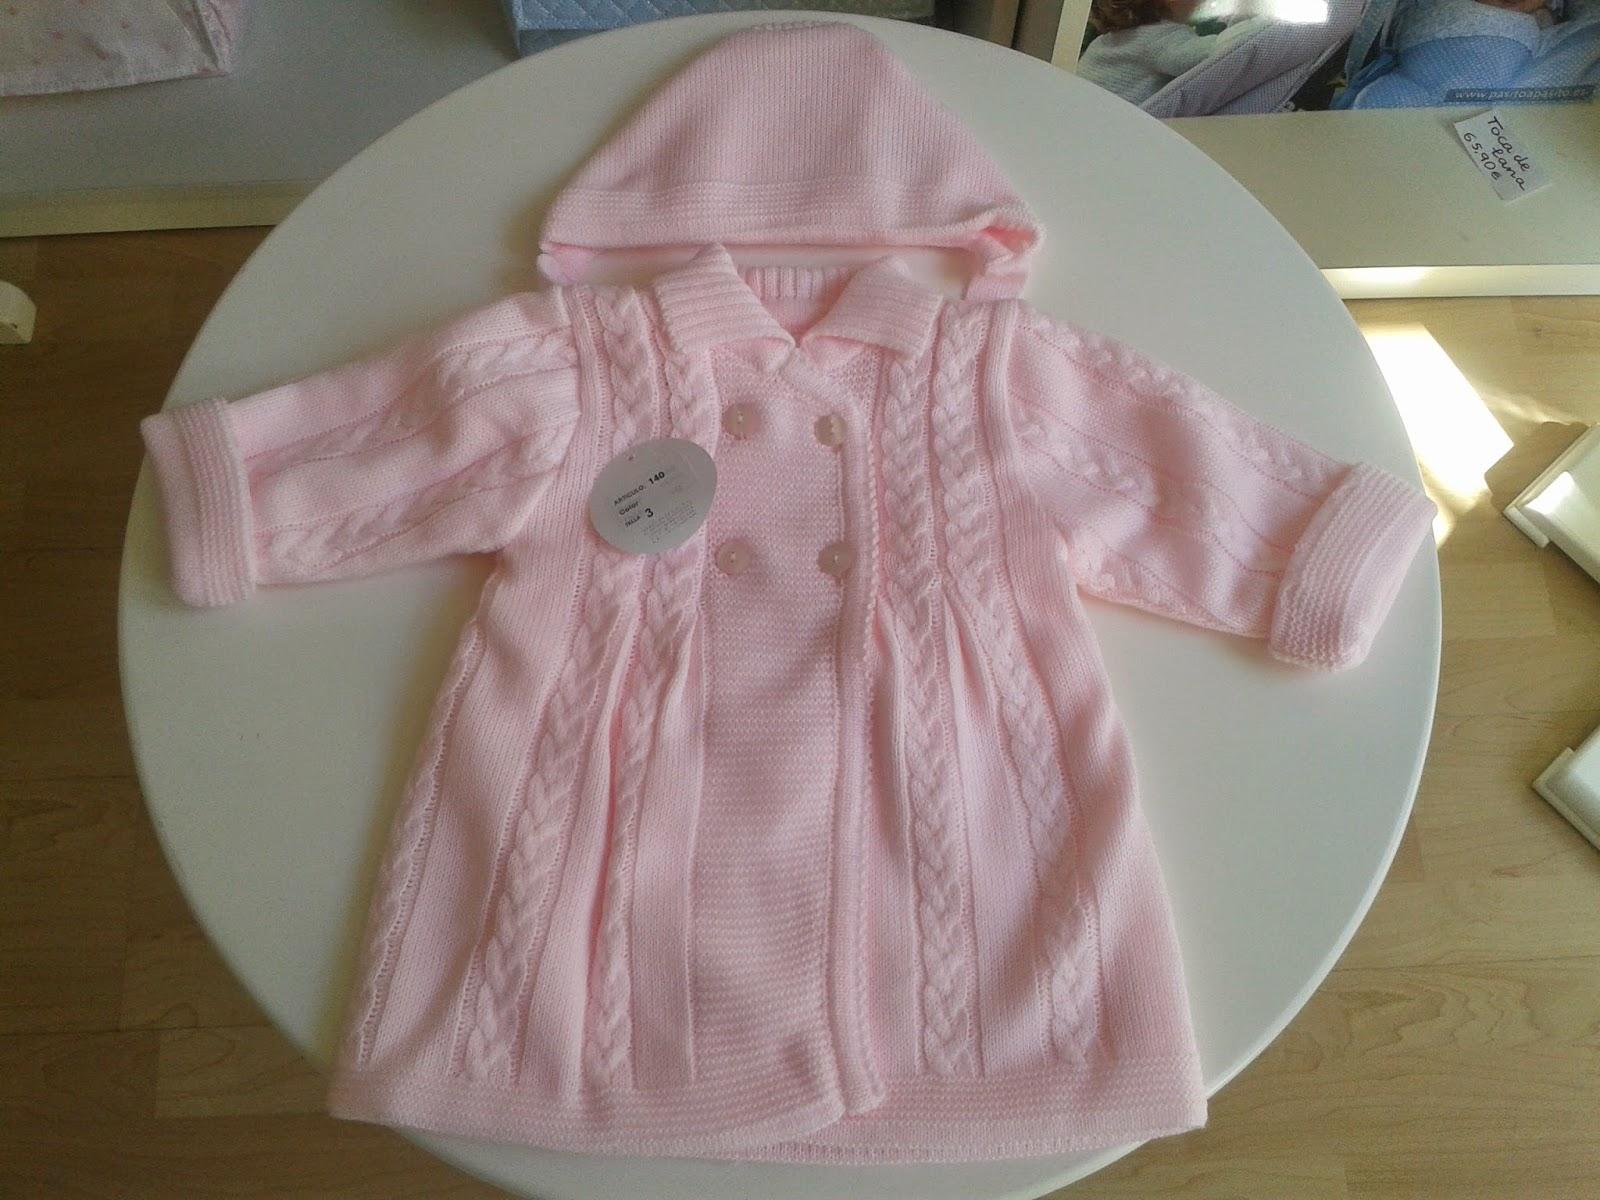 c2b1a74d5 Lazos Bebés  Abrigo bebé lana invierno. Canastilla bebé